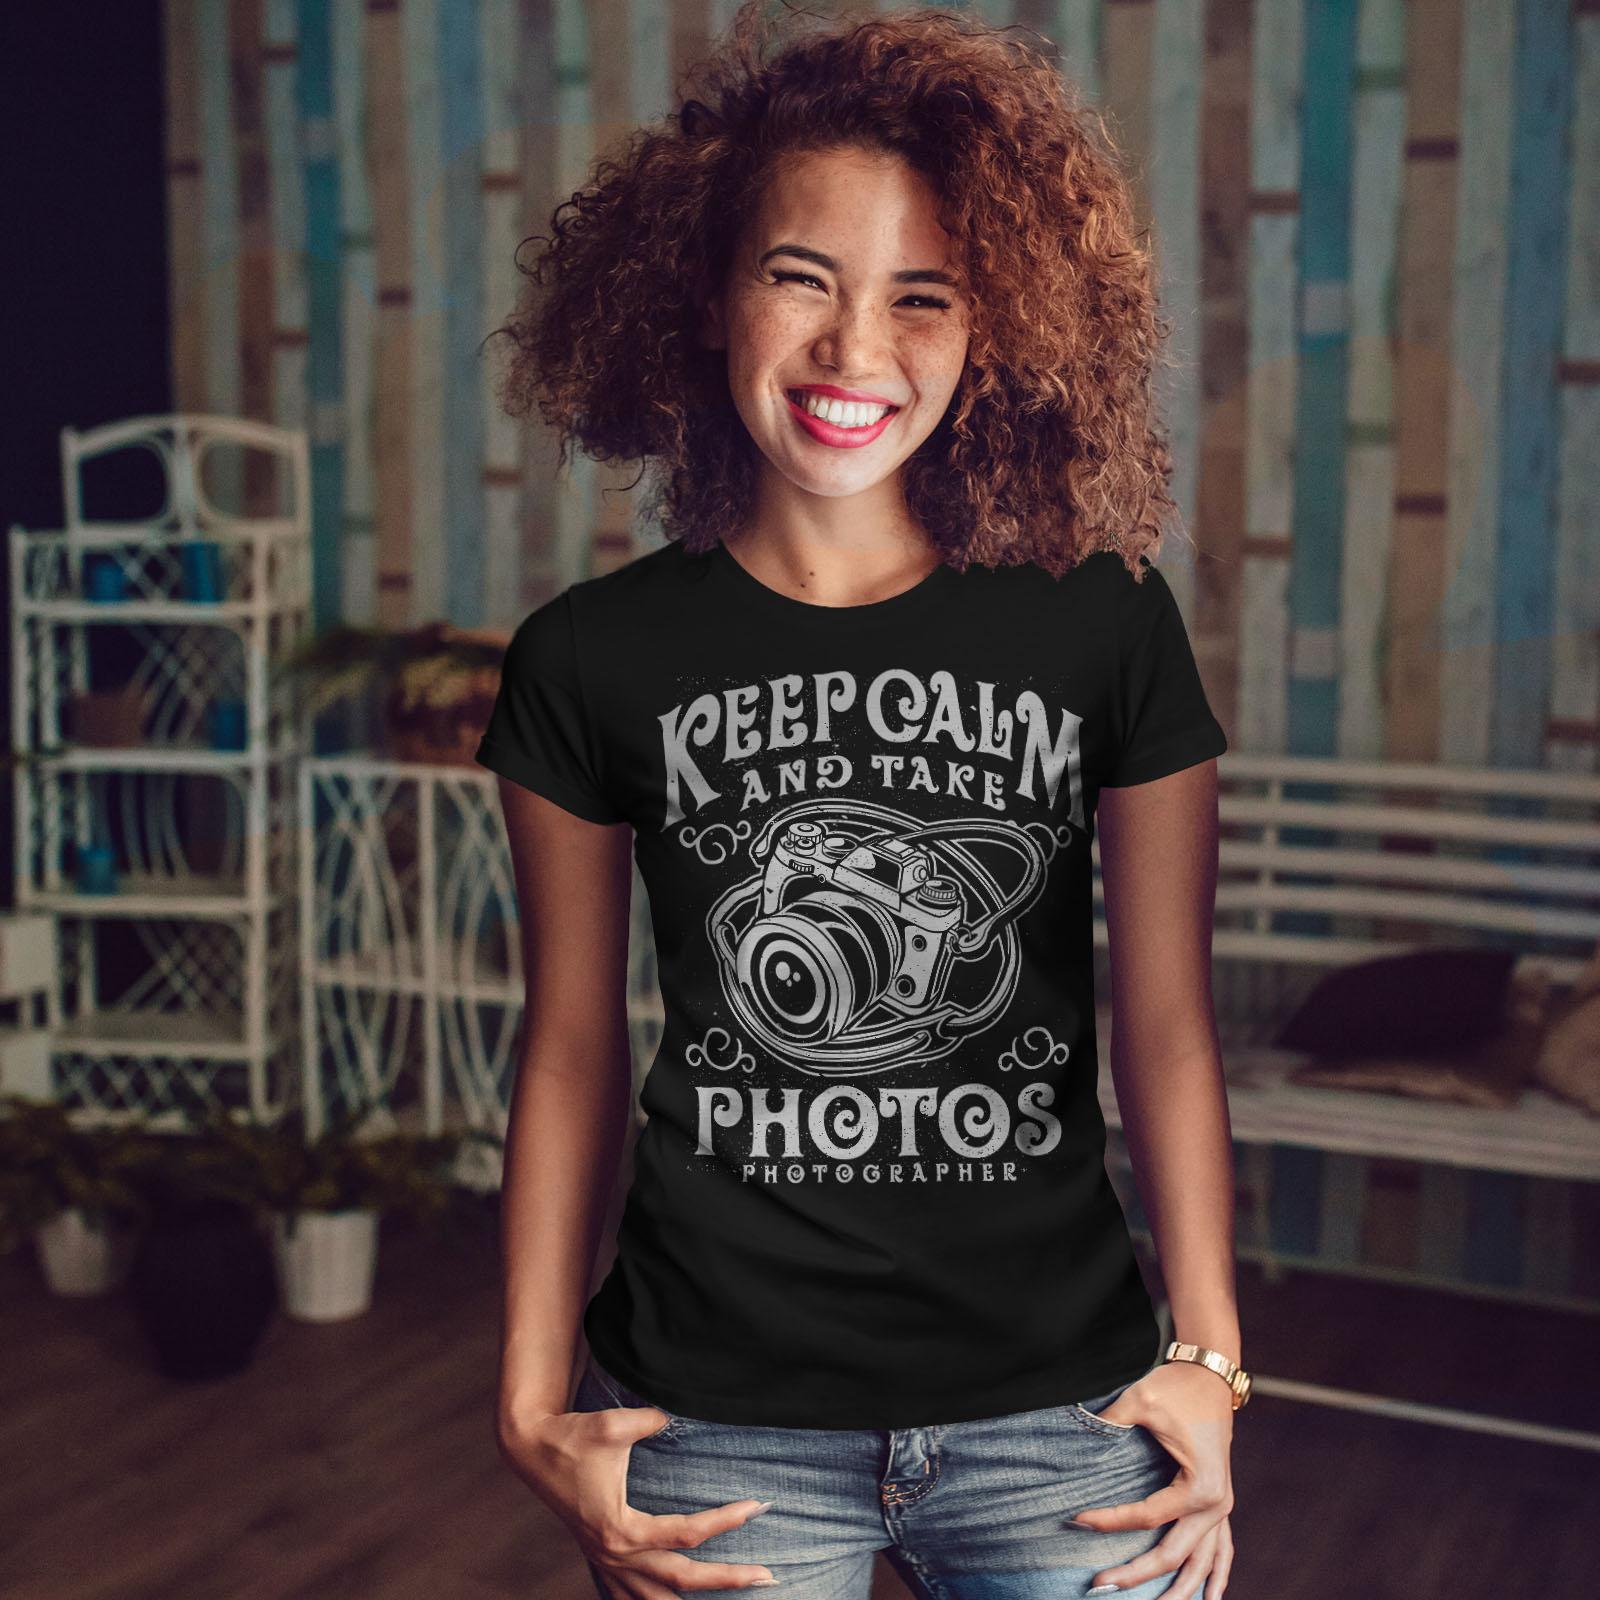 Calm-Photographer-Fashion-Women-T-shirt-NEW-Wellcoda miniatuur 4